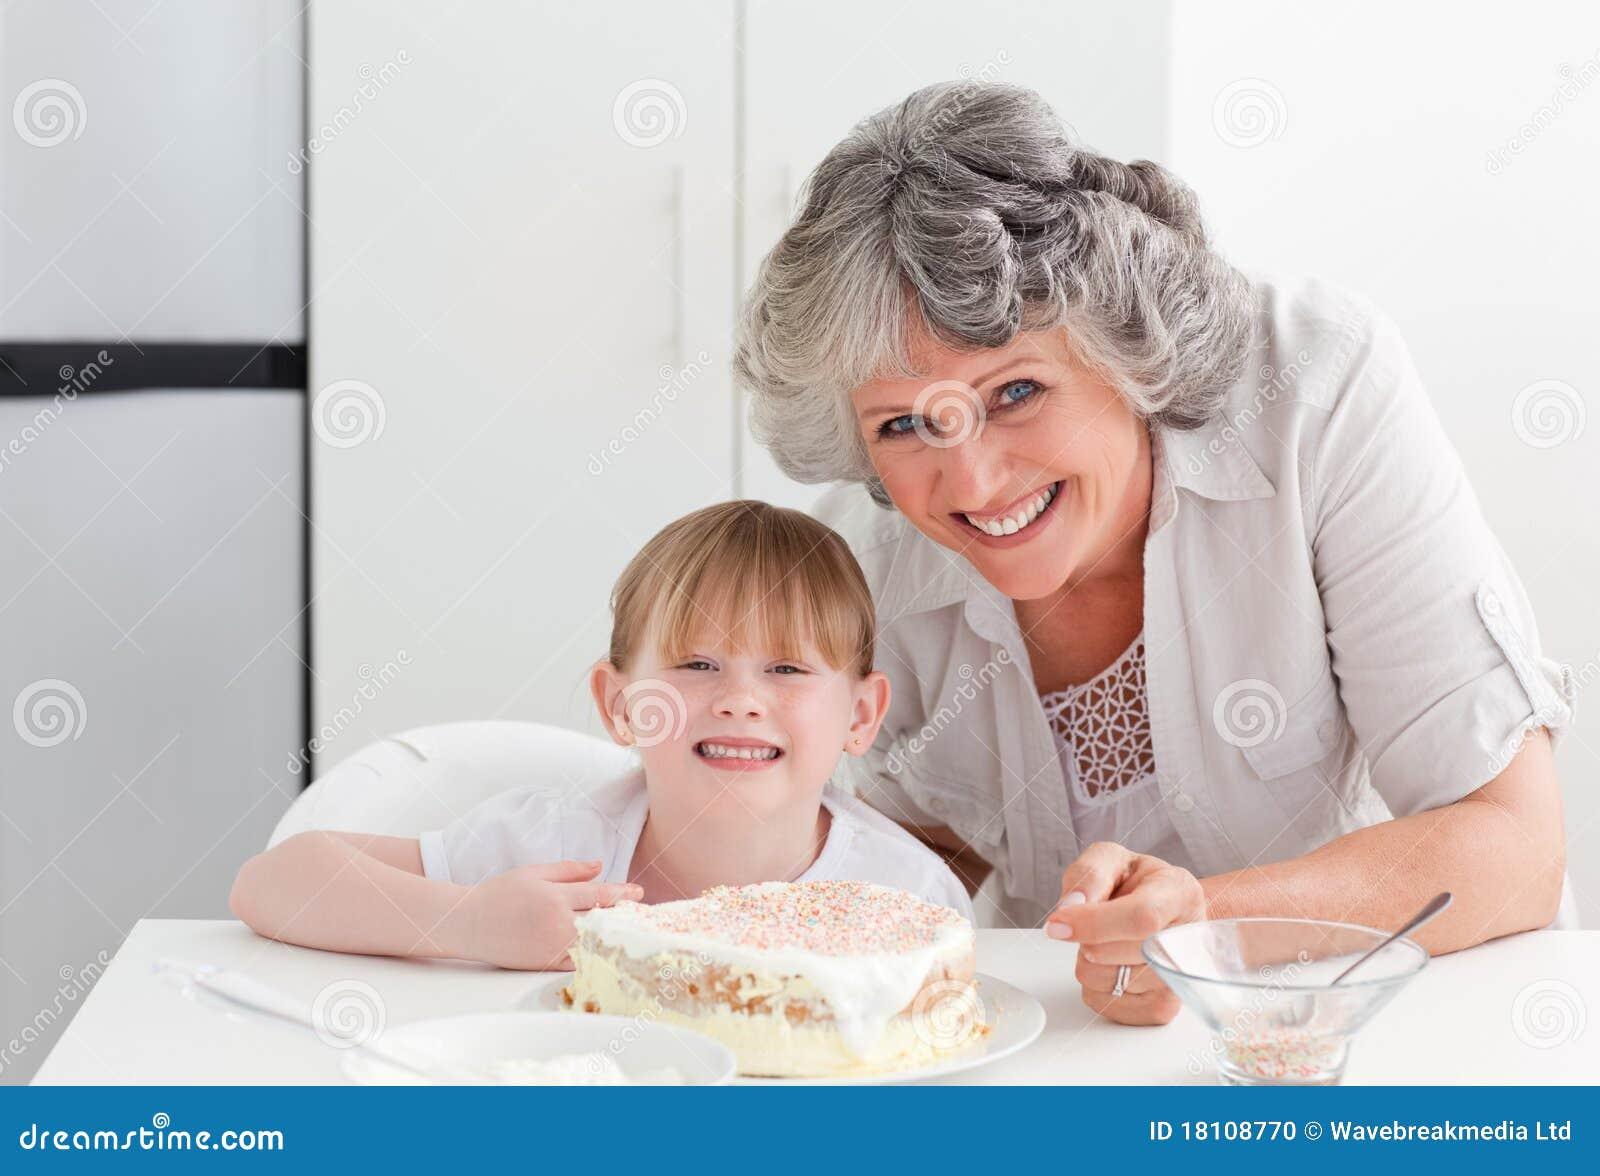 С бабушкой на кухне 23 фотография